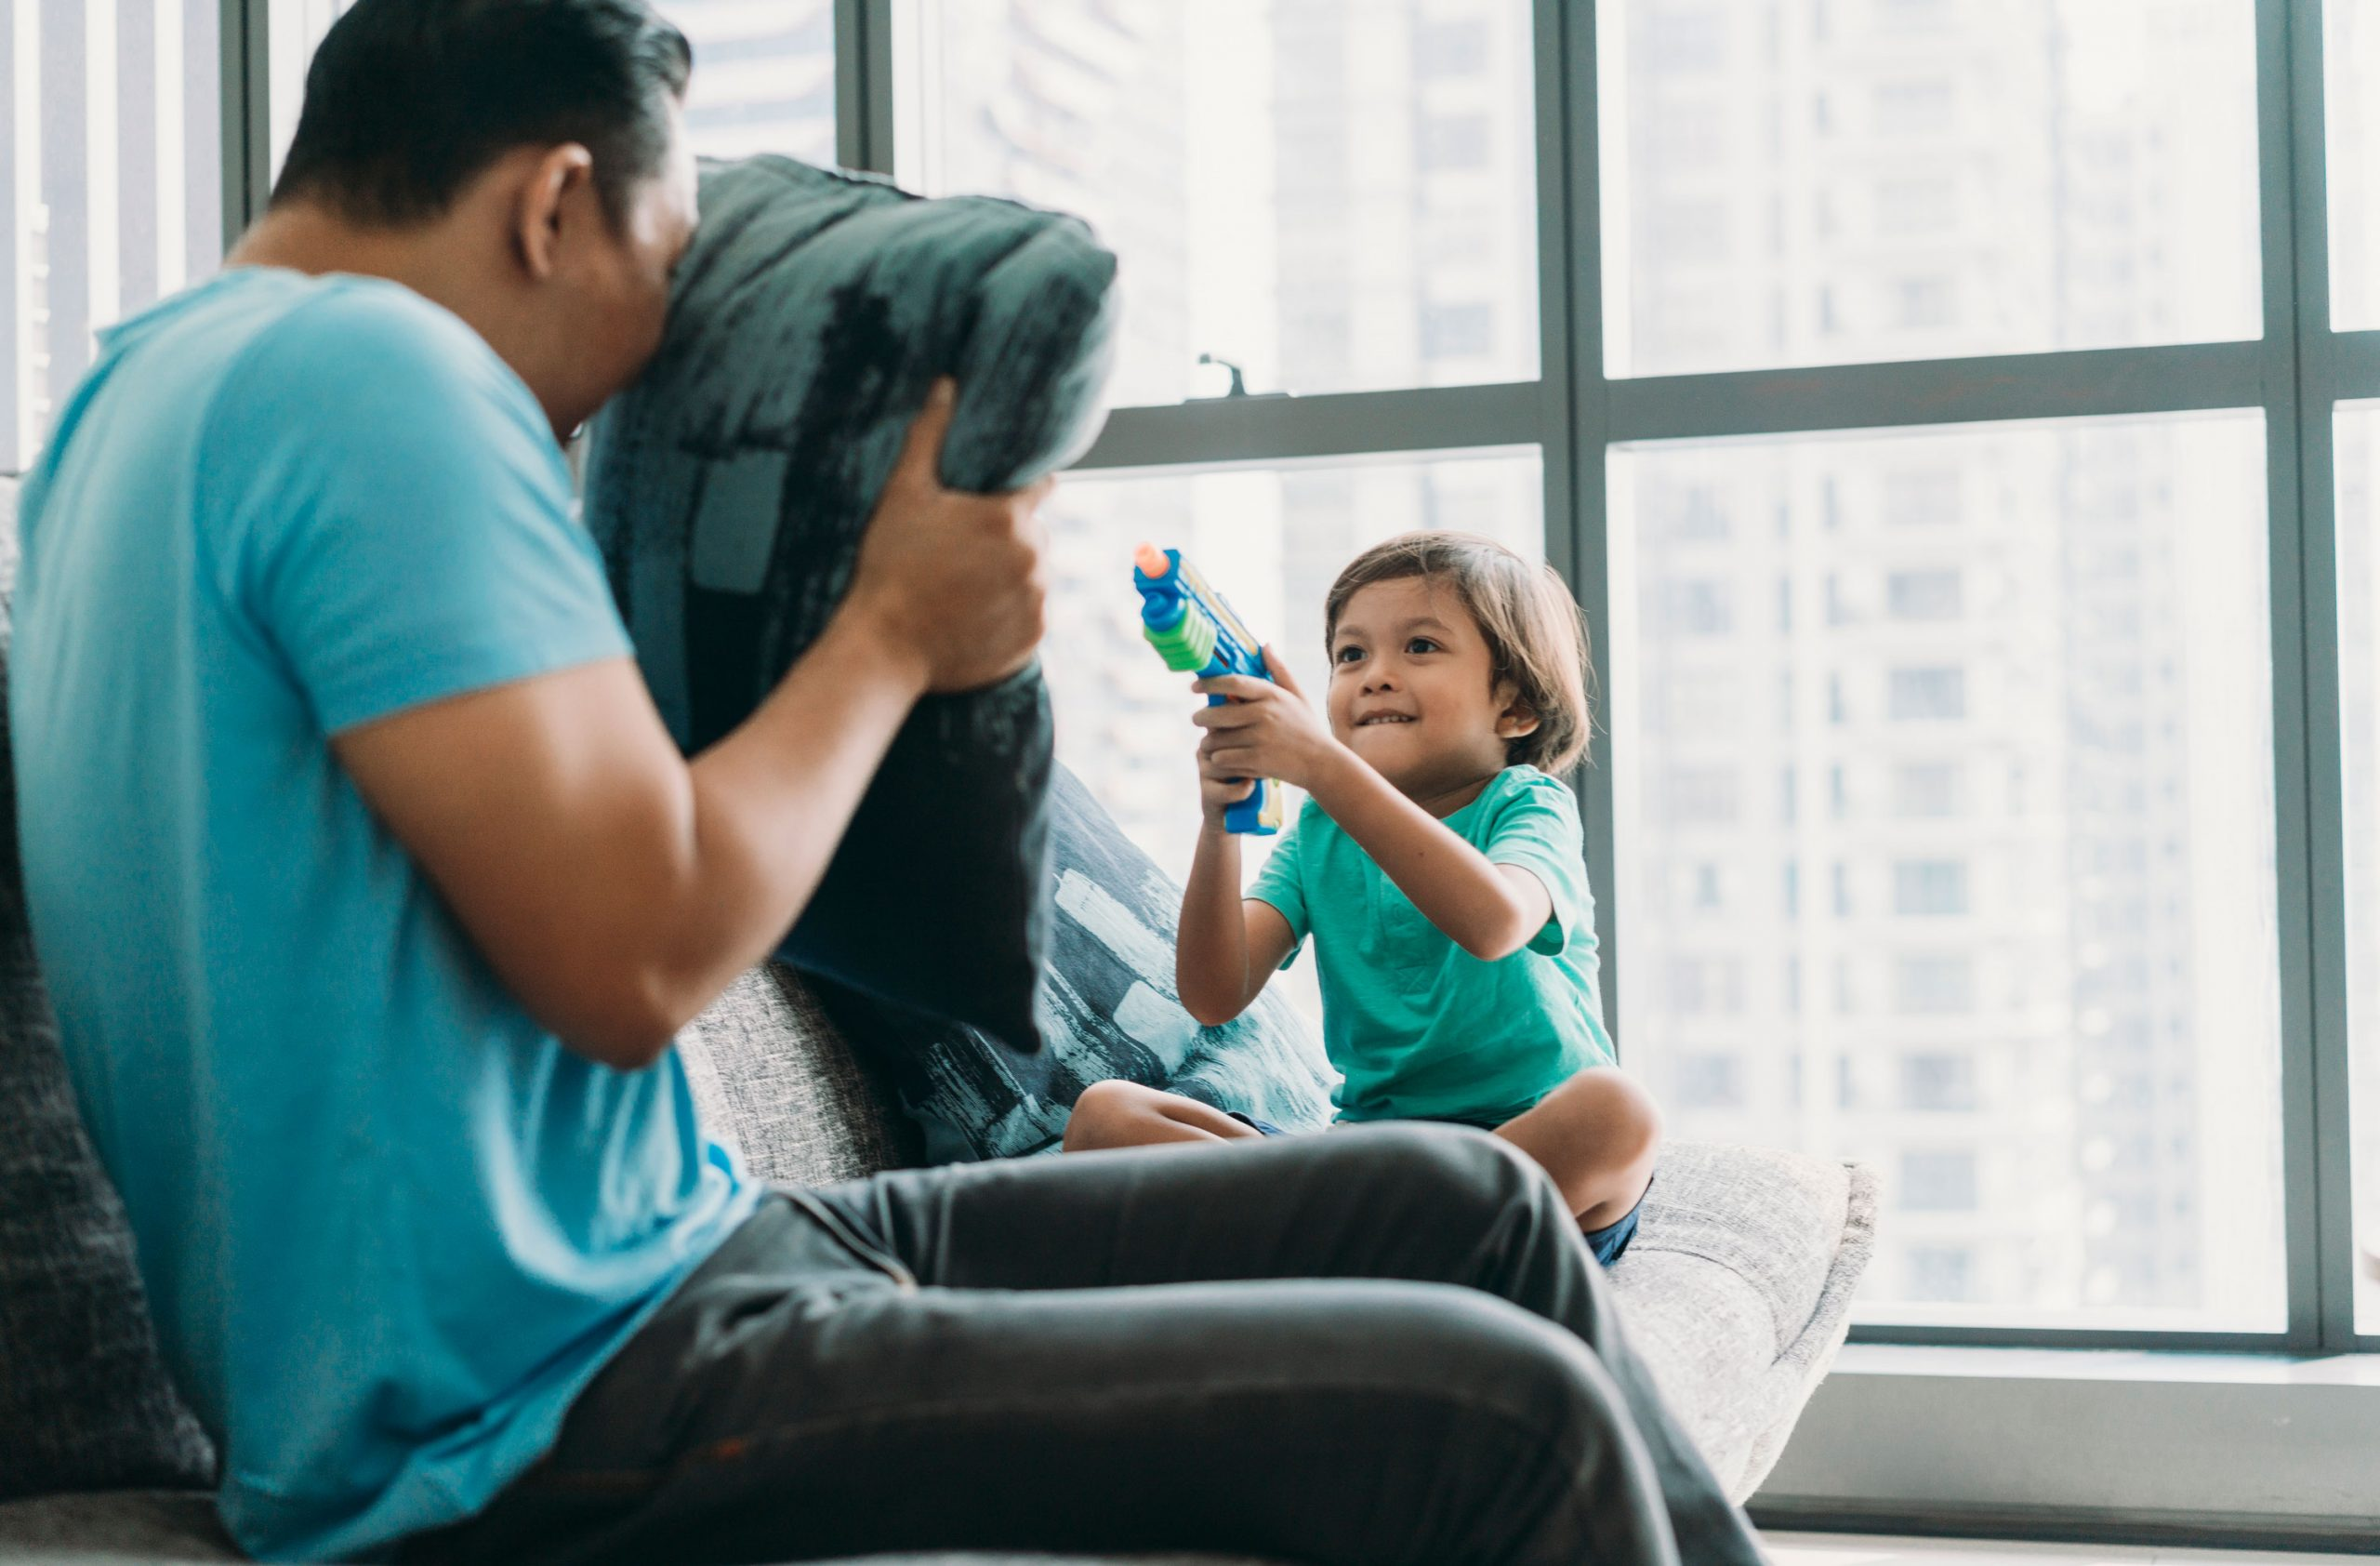 Boy playing with toy gun